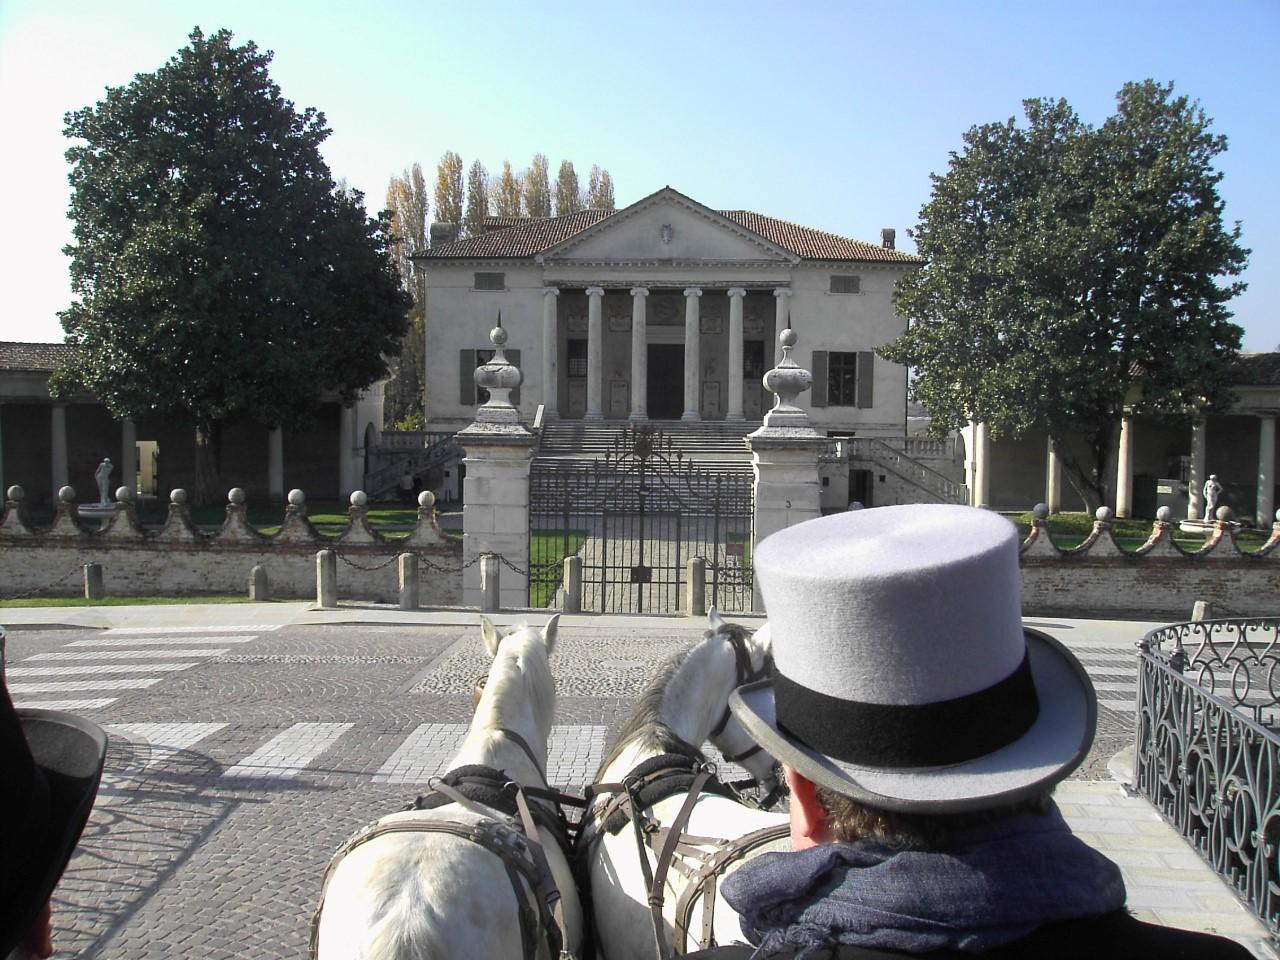 Rovigo e la sua provincia: tanti tesori poco conosciuti